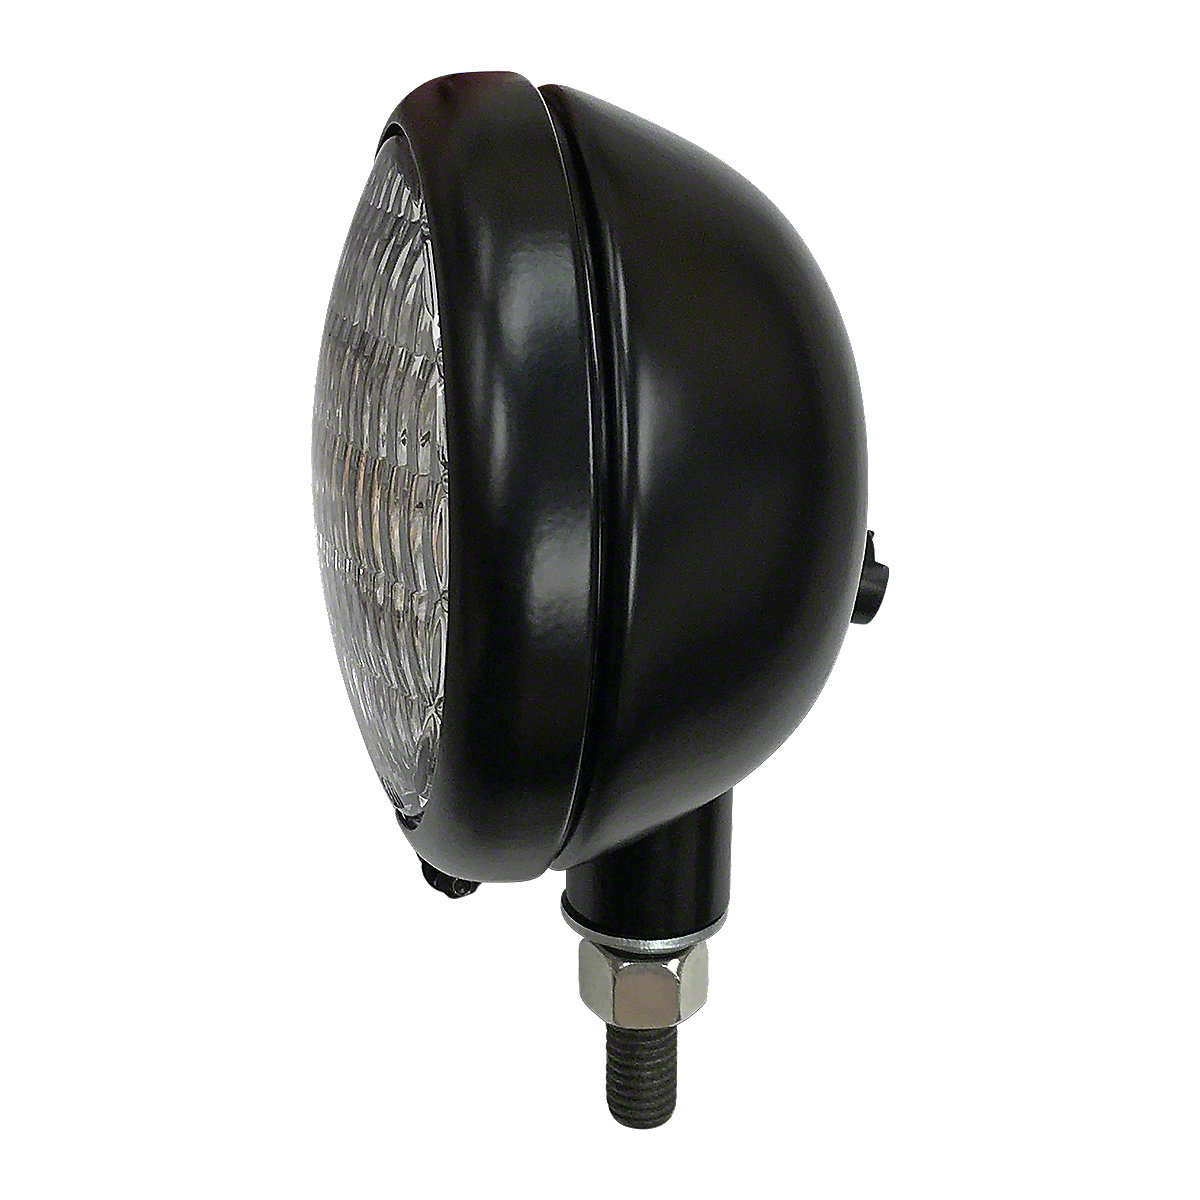 6 Volt Tractor Headlight Bulb : Jds volt sealed beam head light